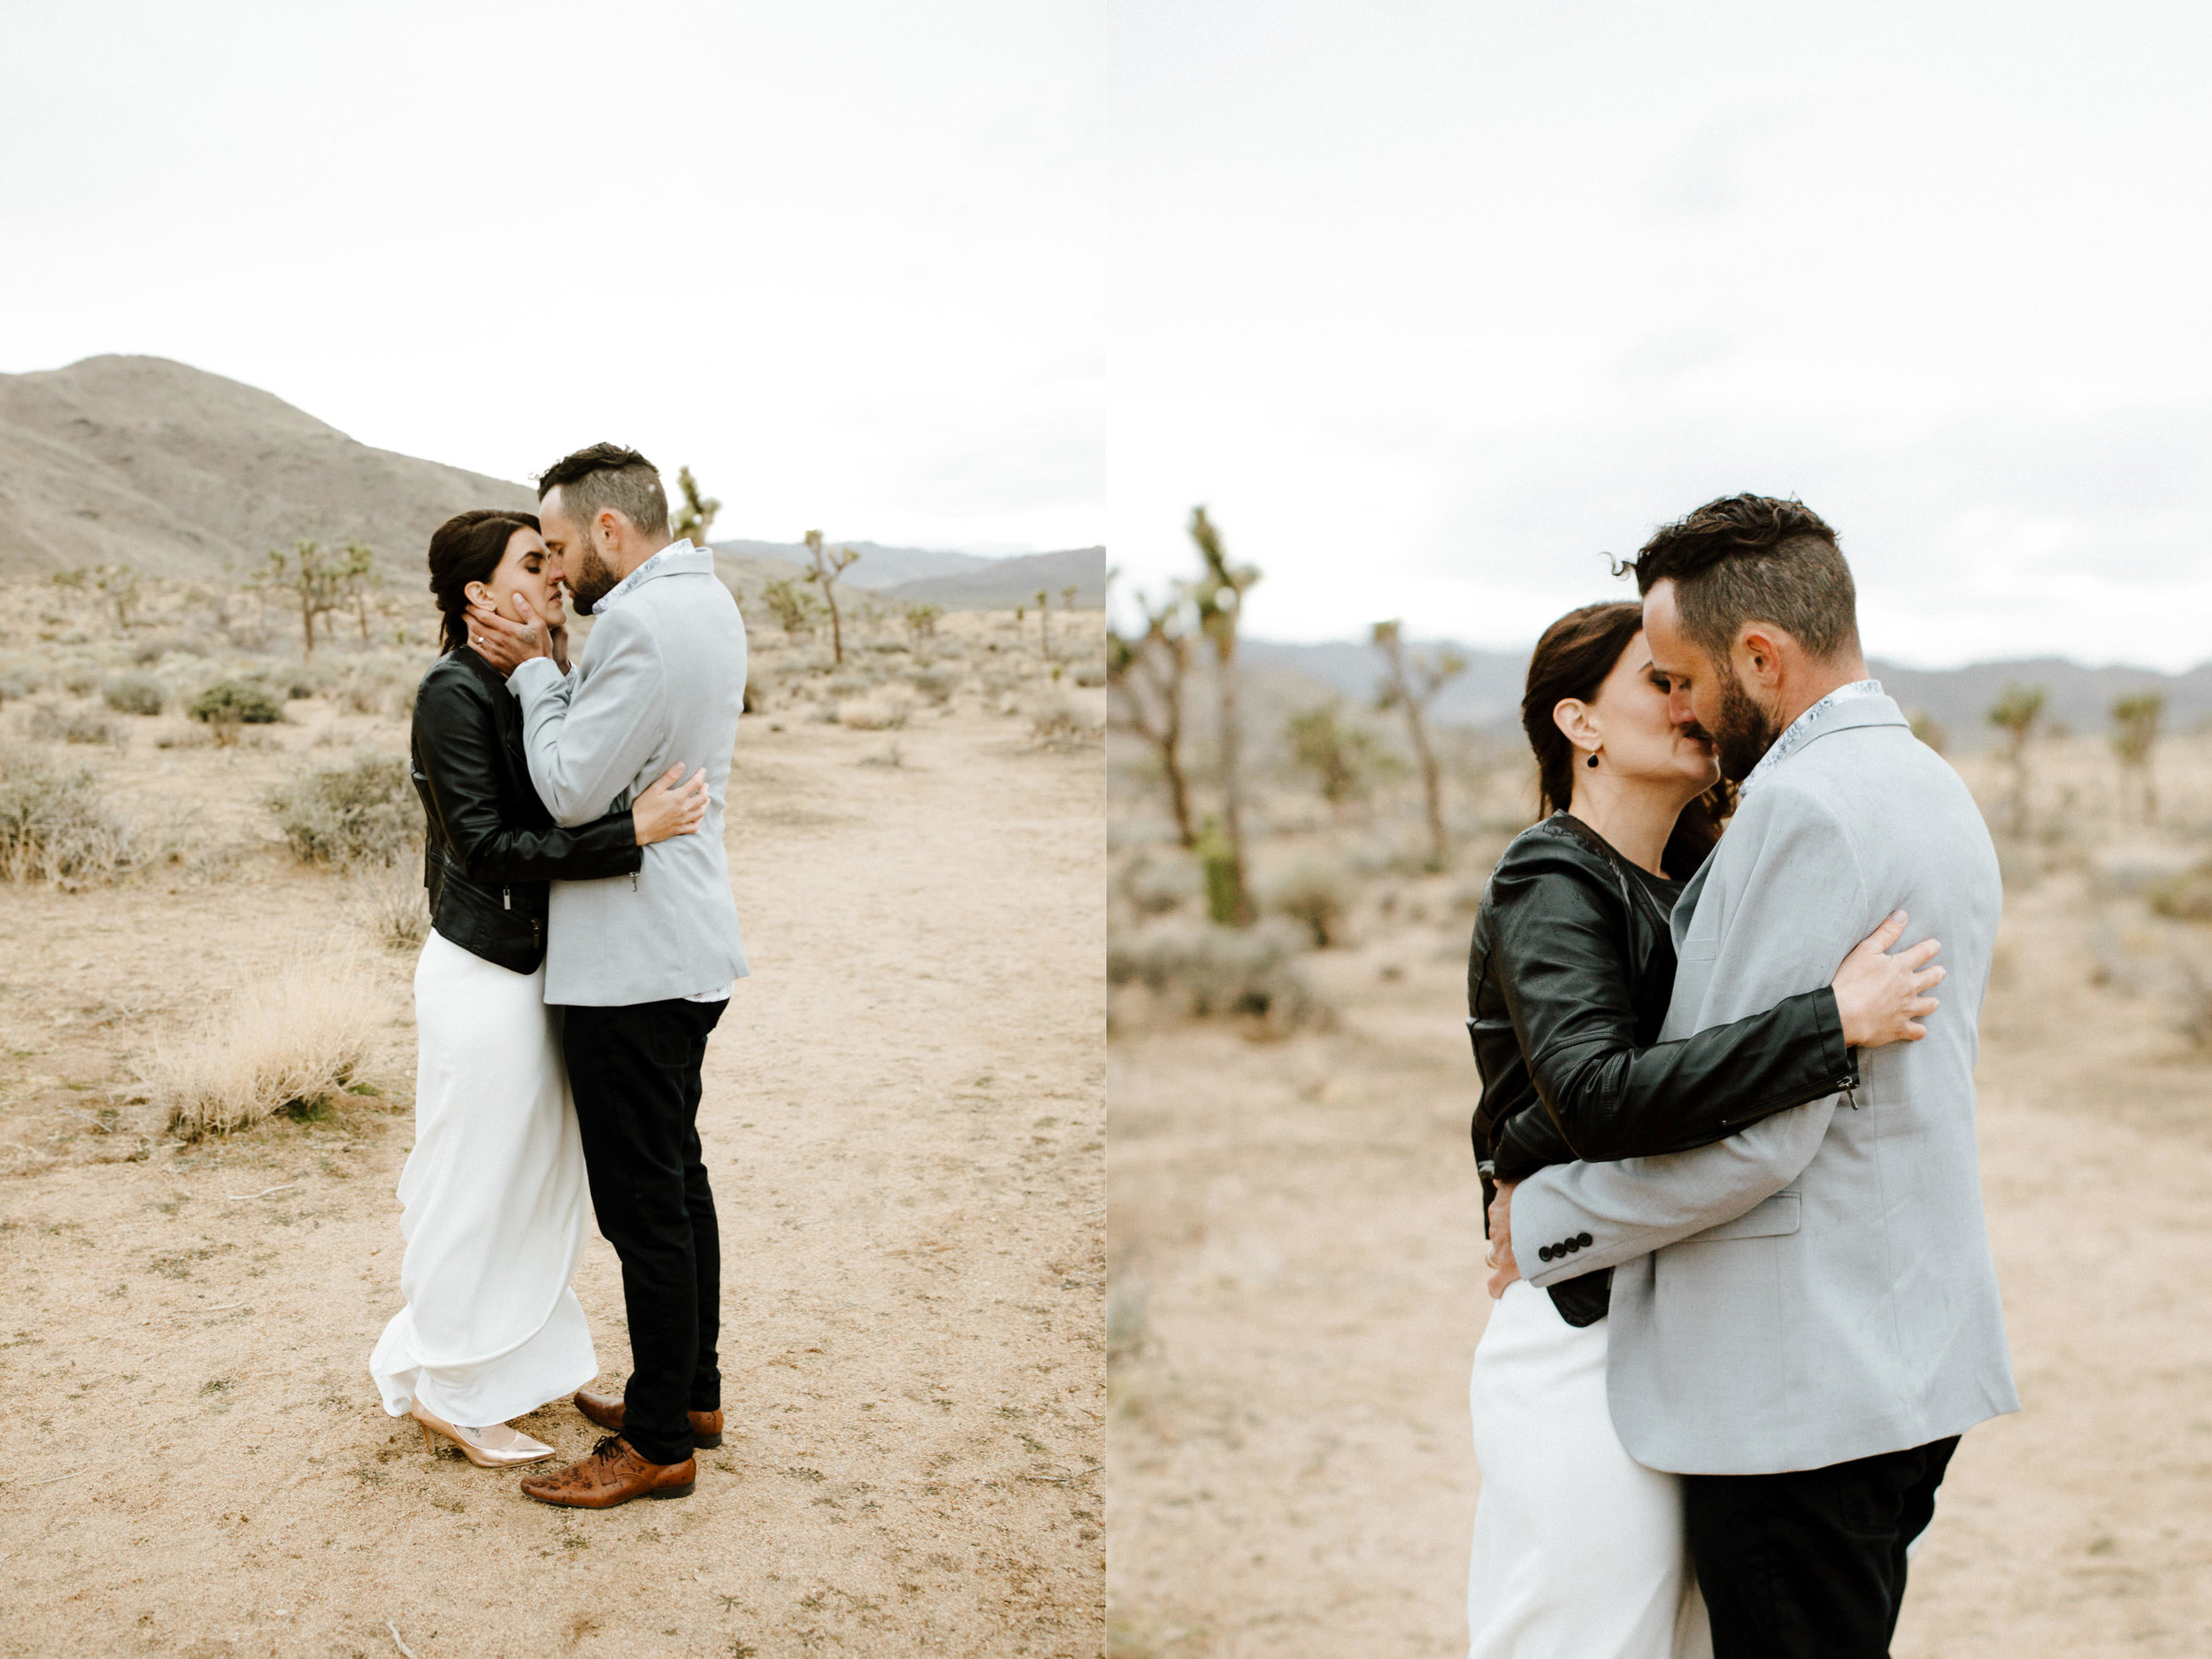 Joshua Tree America Elopement Wedding 9.jpg